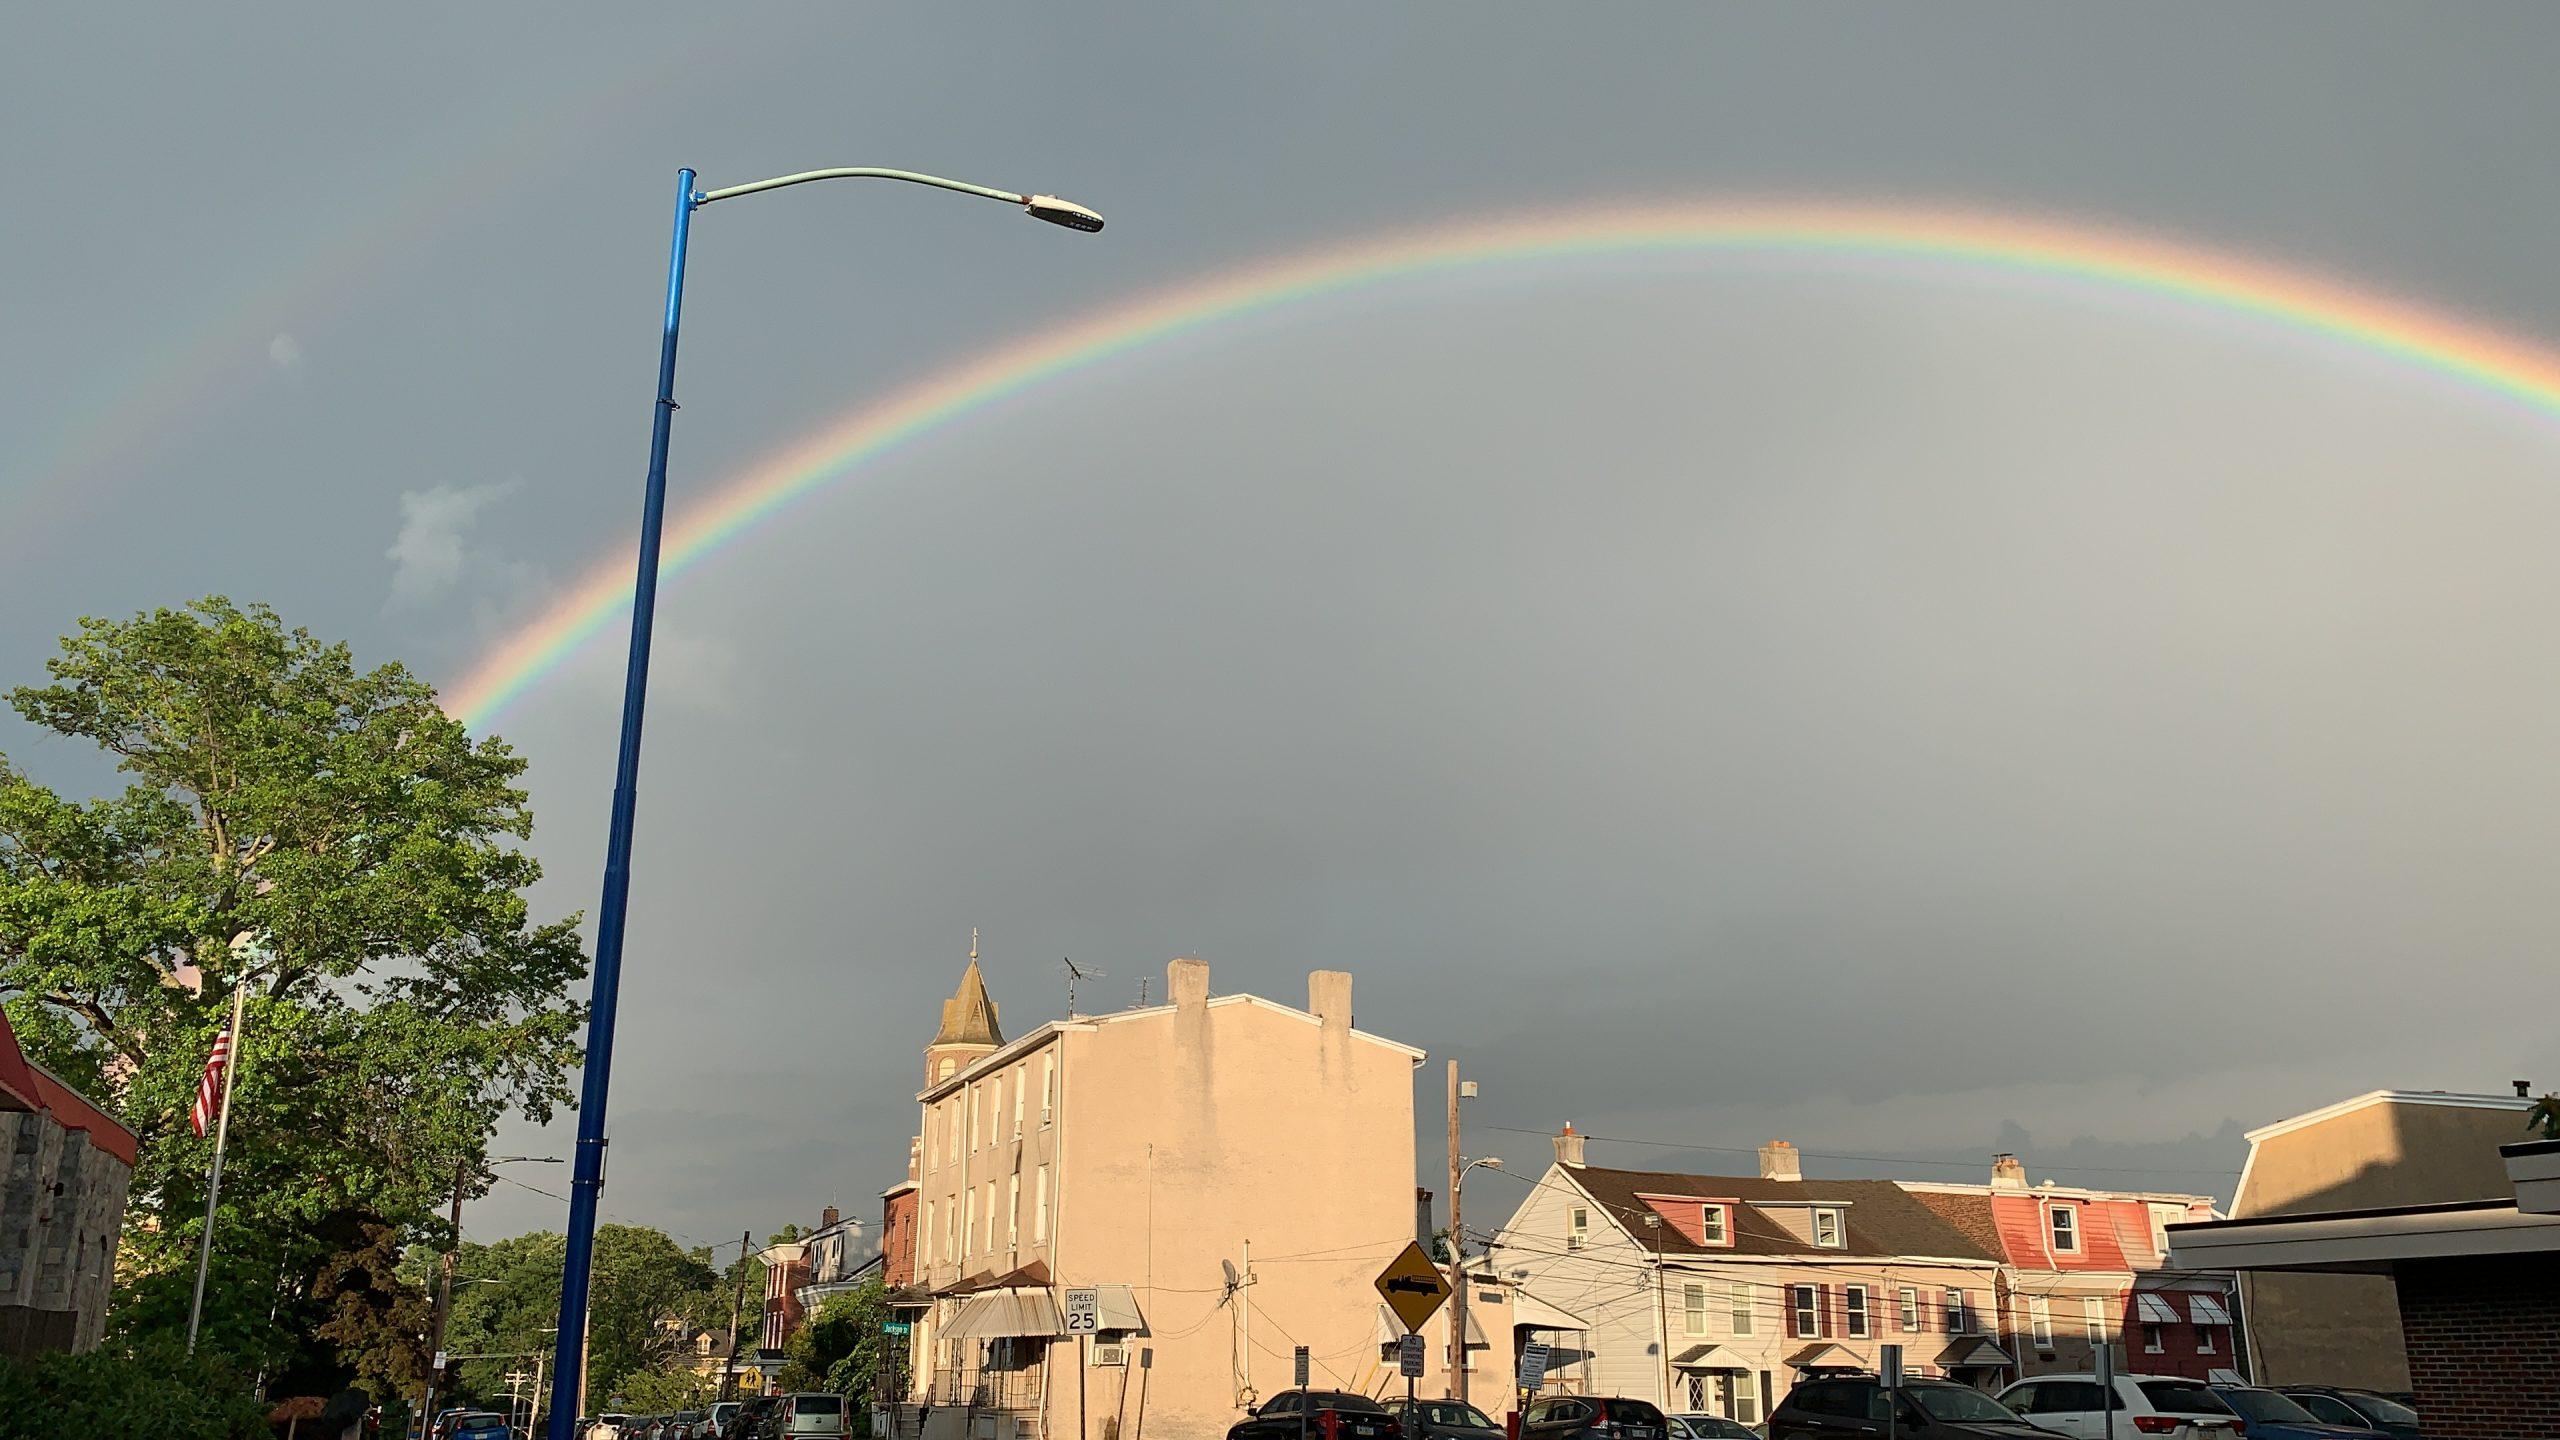 Double Rainbow & Tacos Thursday in Phoenixville PA